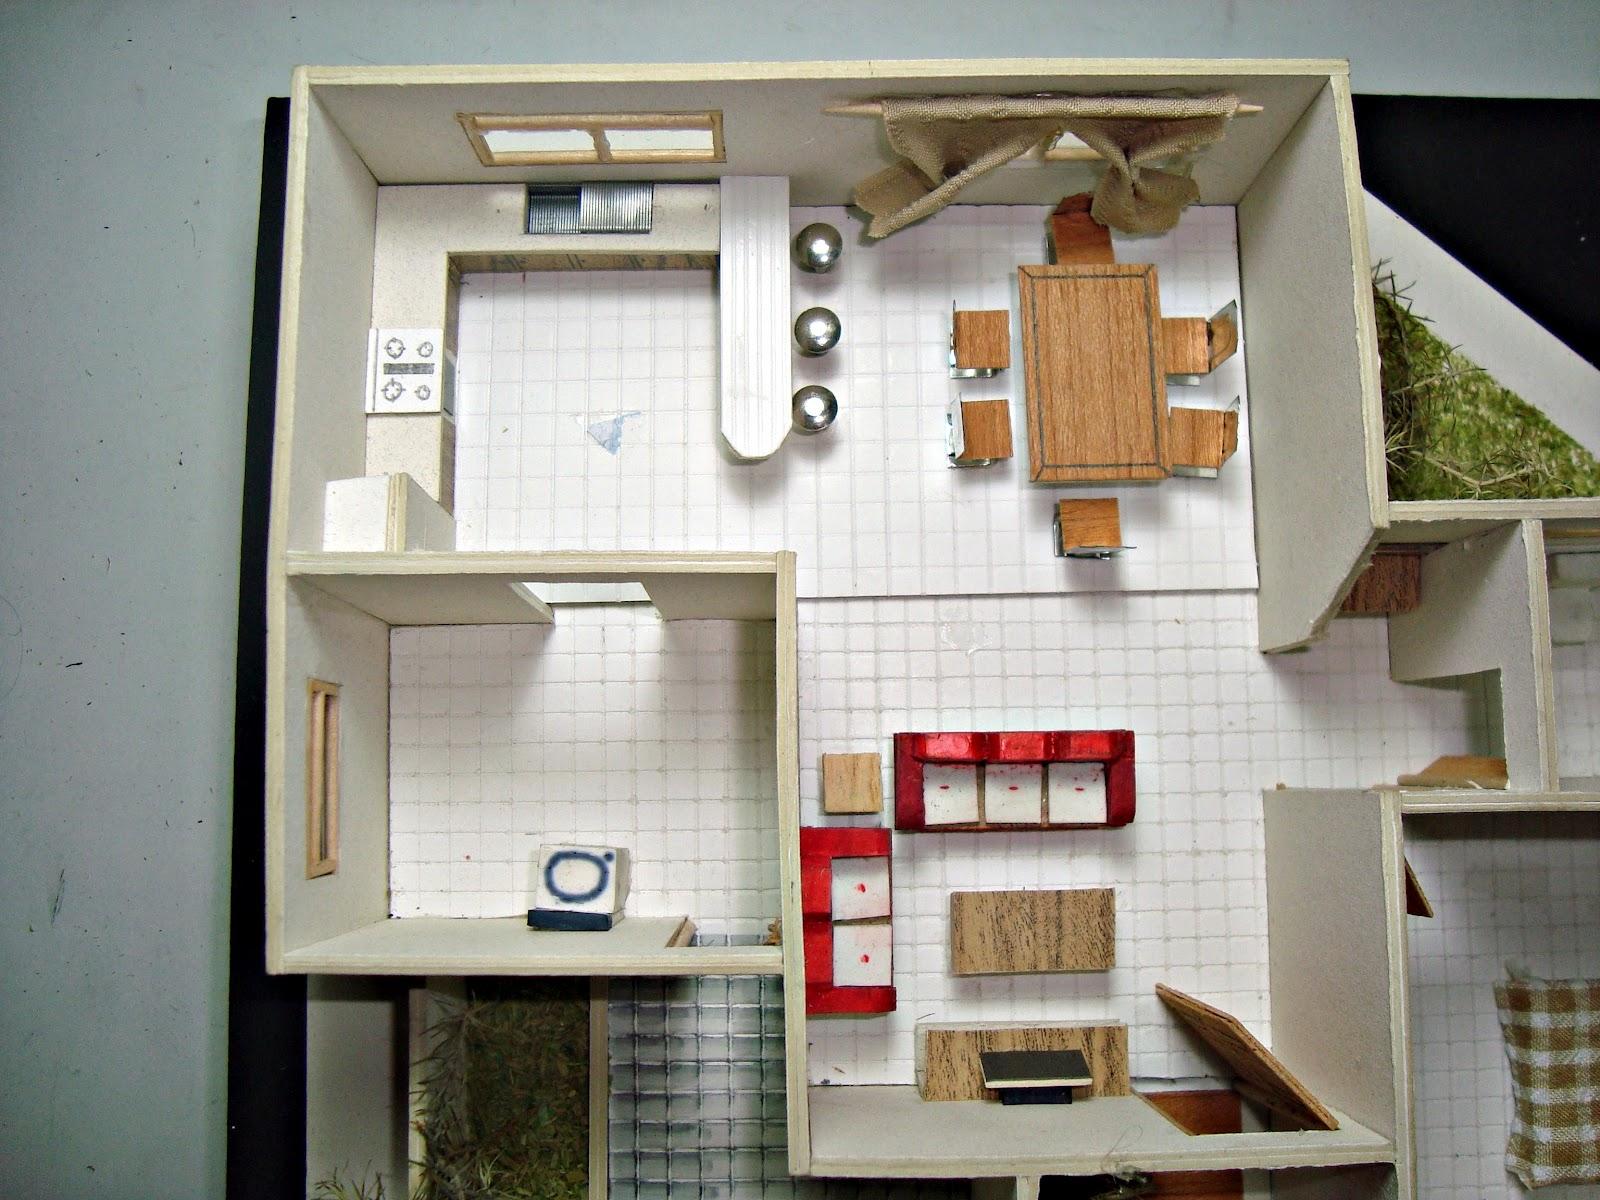 Portafolio dise o arquitect nico modelos arquitectonicos 1 for Diseno de casa sala comedor y cocina